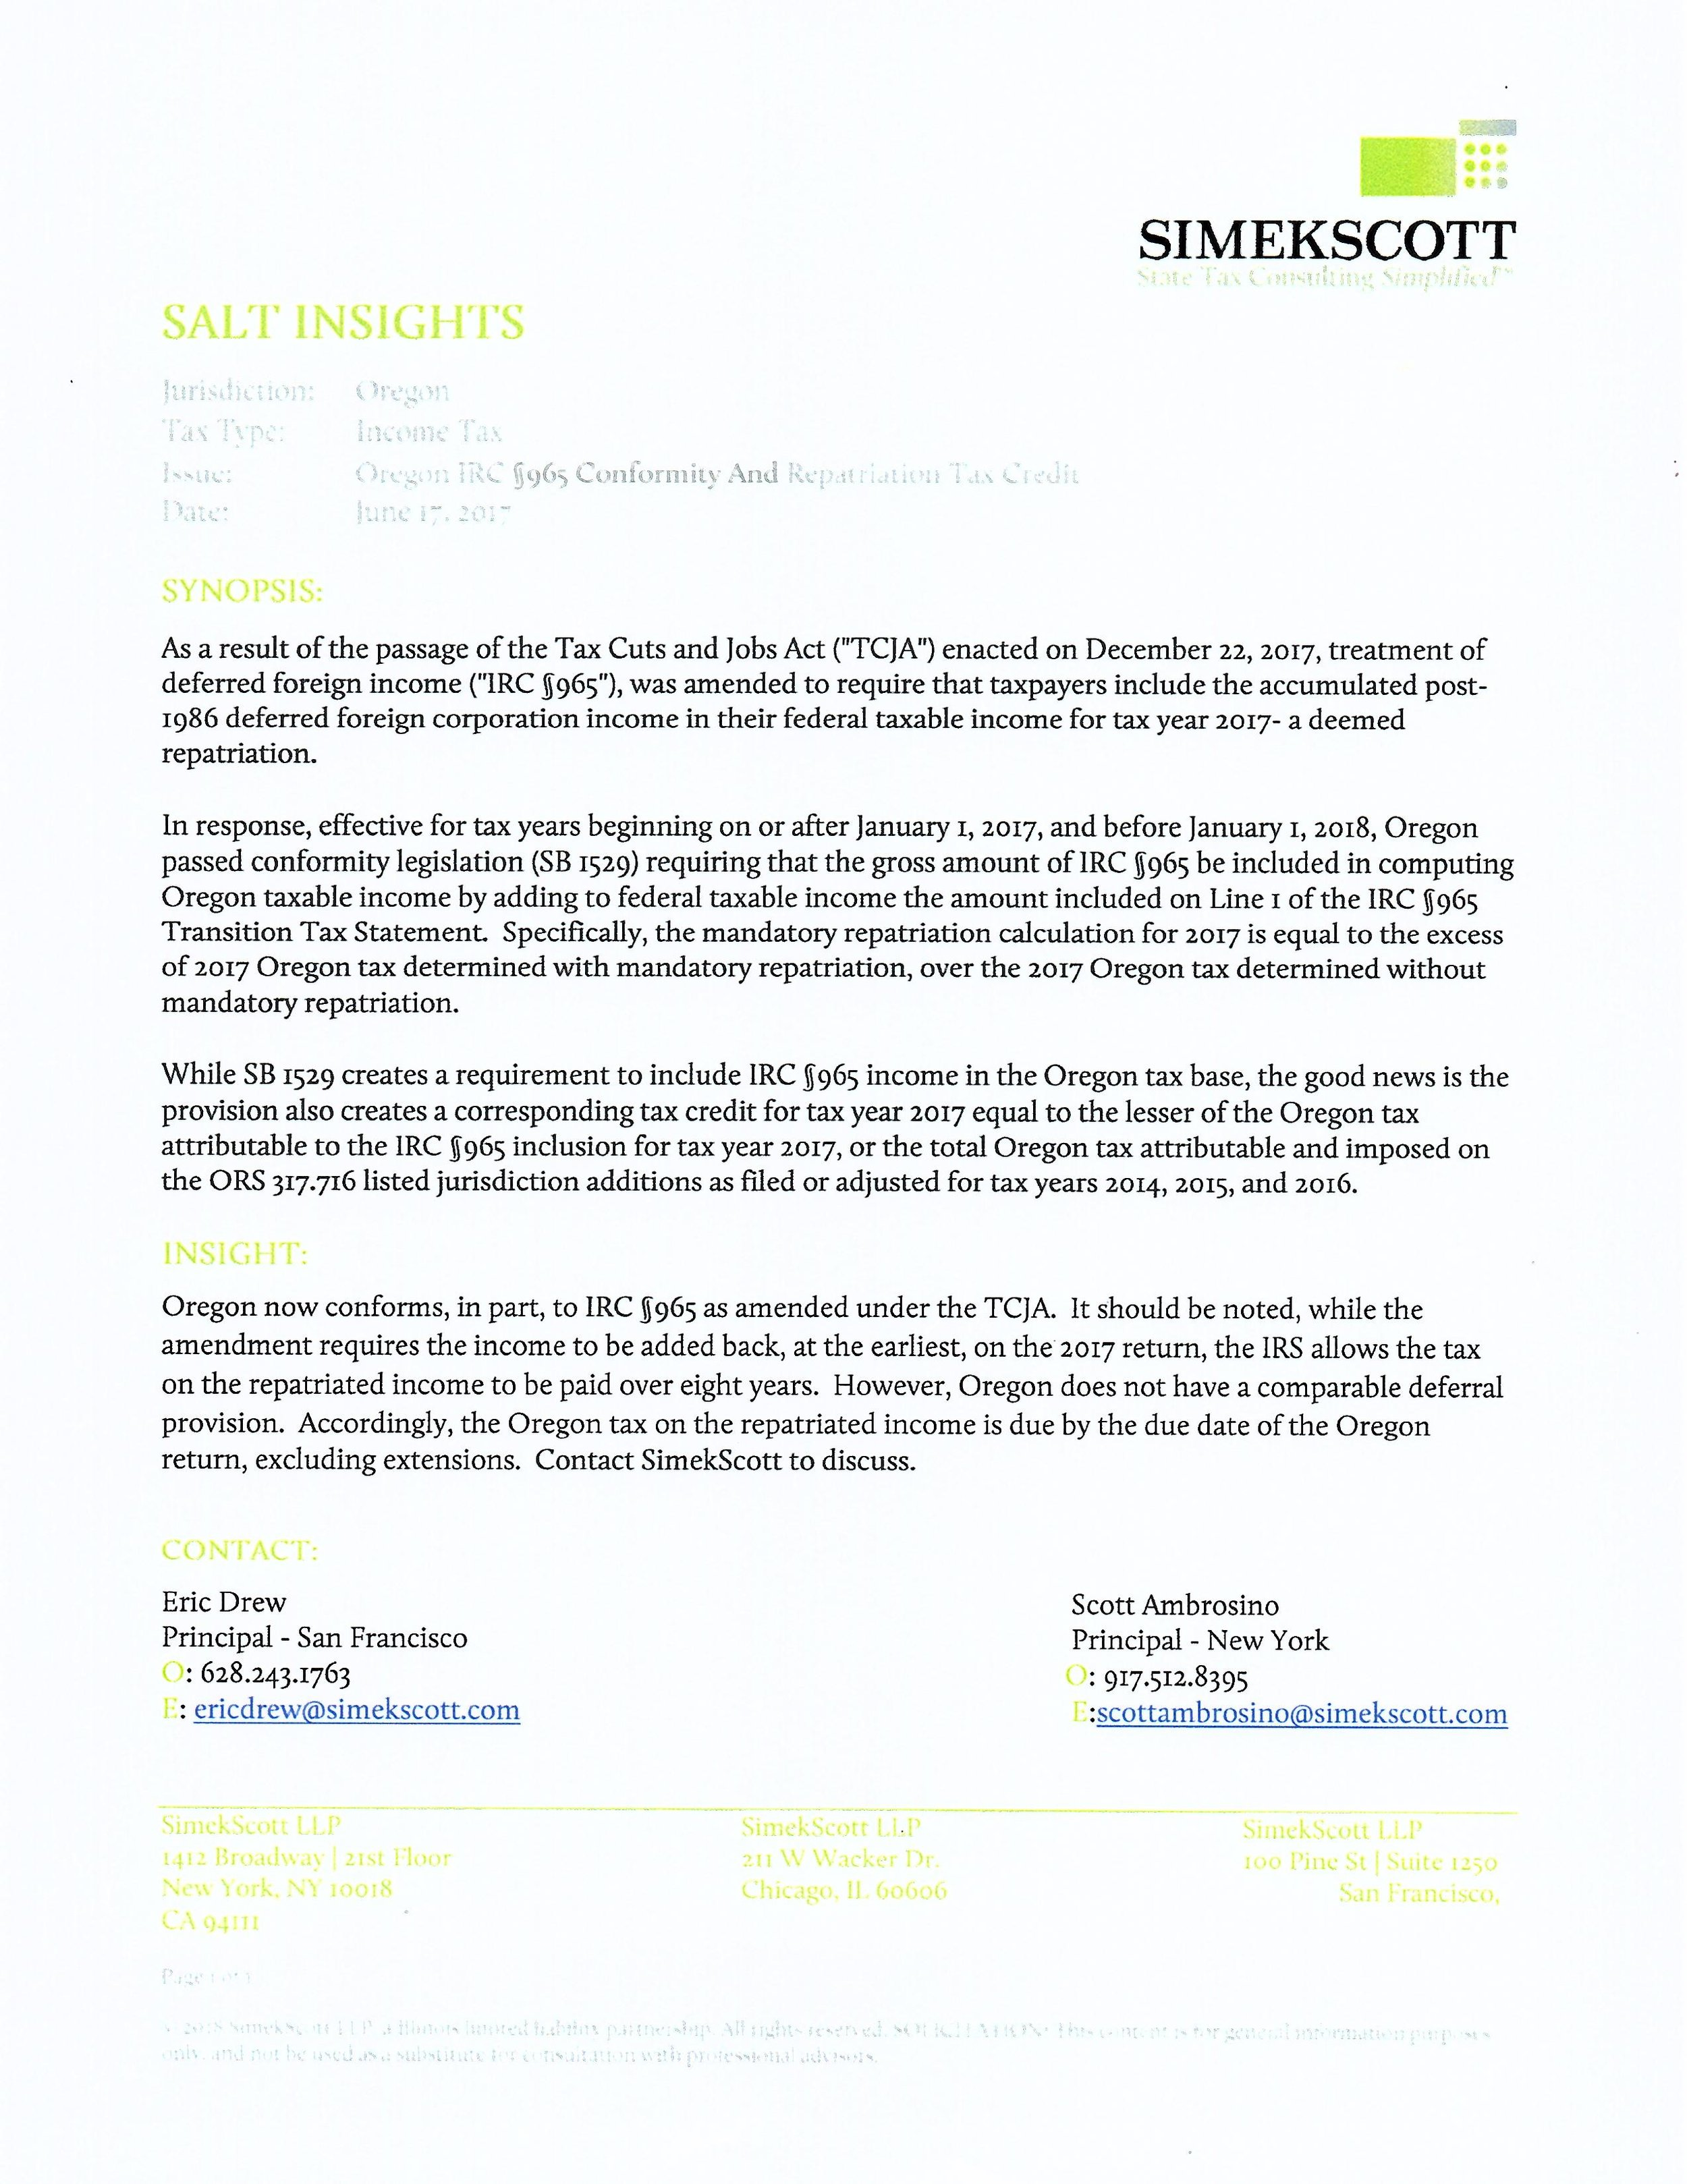 Oregon_TCJA_IRC_Conformity_And_Repatriation_Tax_Credit.jpg